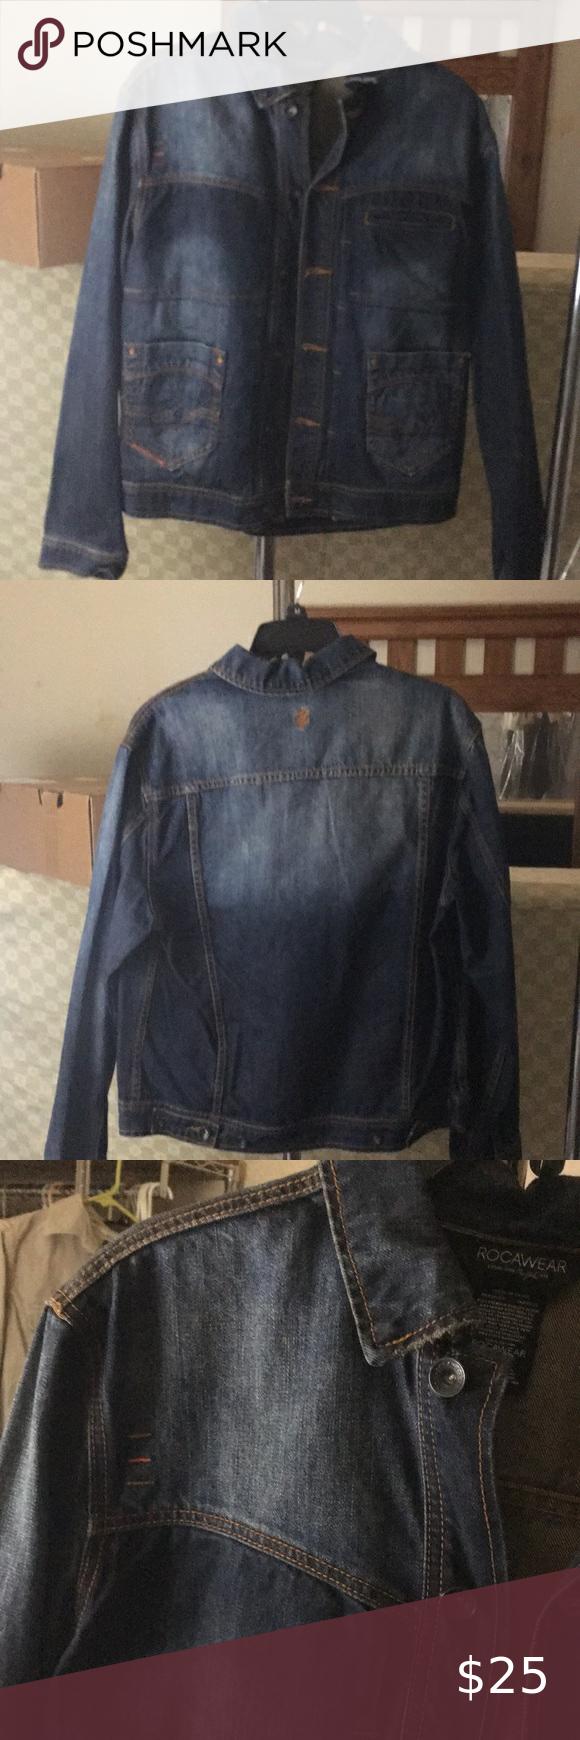 Rocawear Denim Jacket Faded Denim Jacket With Modern Day Retro Western Stitching Only Wore Once In Excellen Denim Coat Jacket Denim Jacket Faded Denim Jackets [ 1740 x 580 Pixel ]